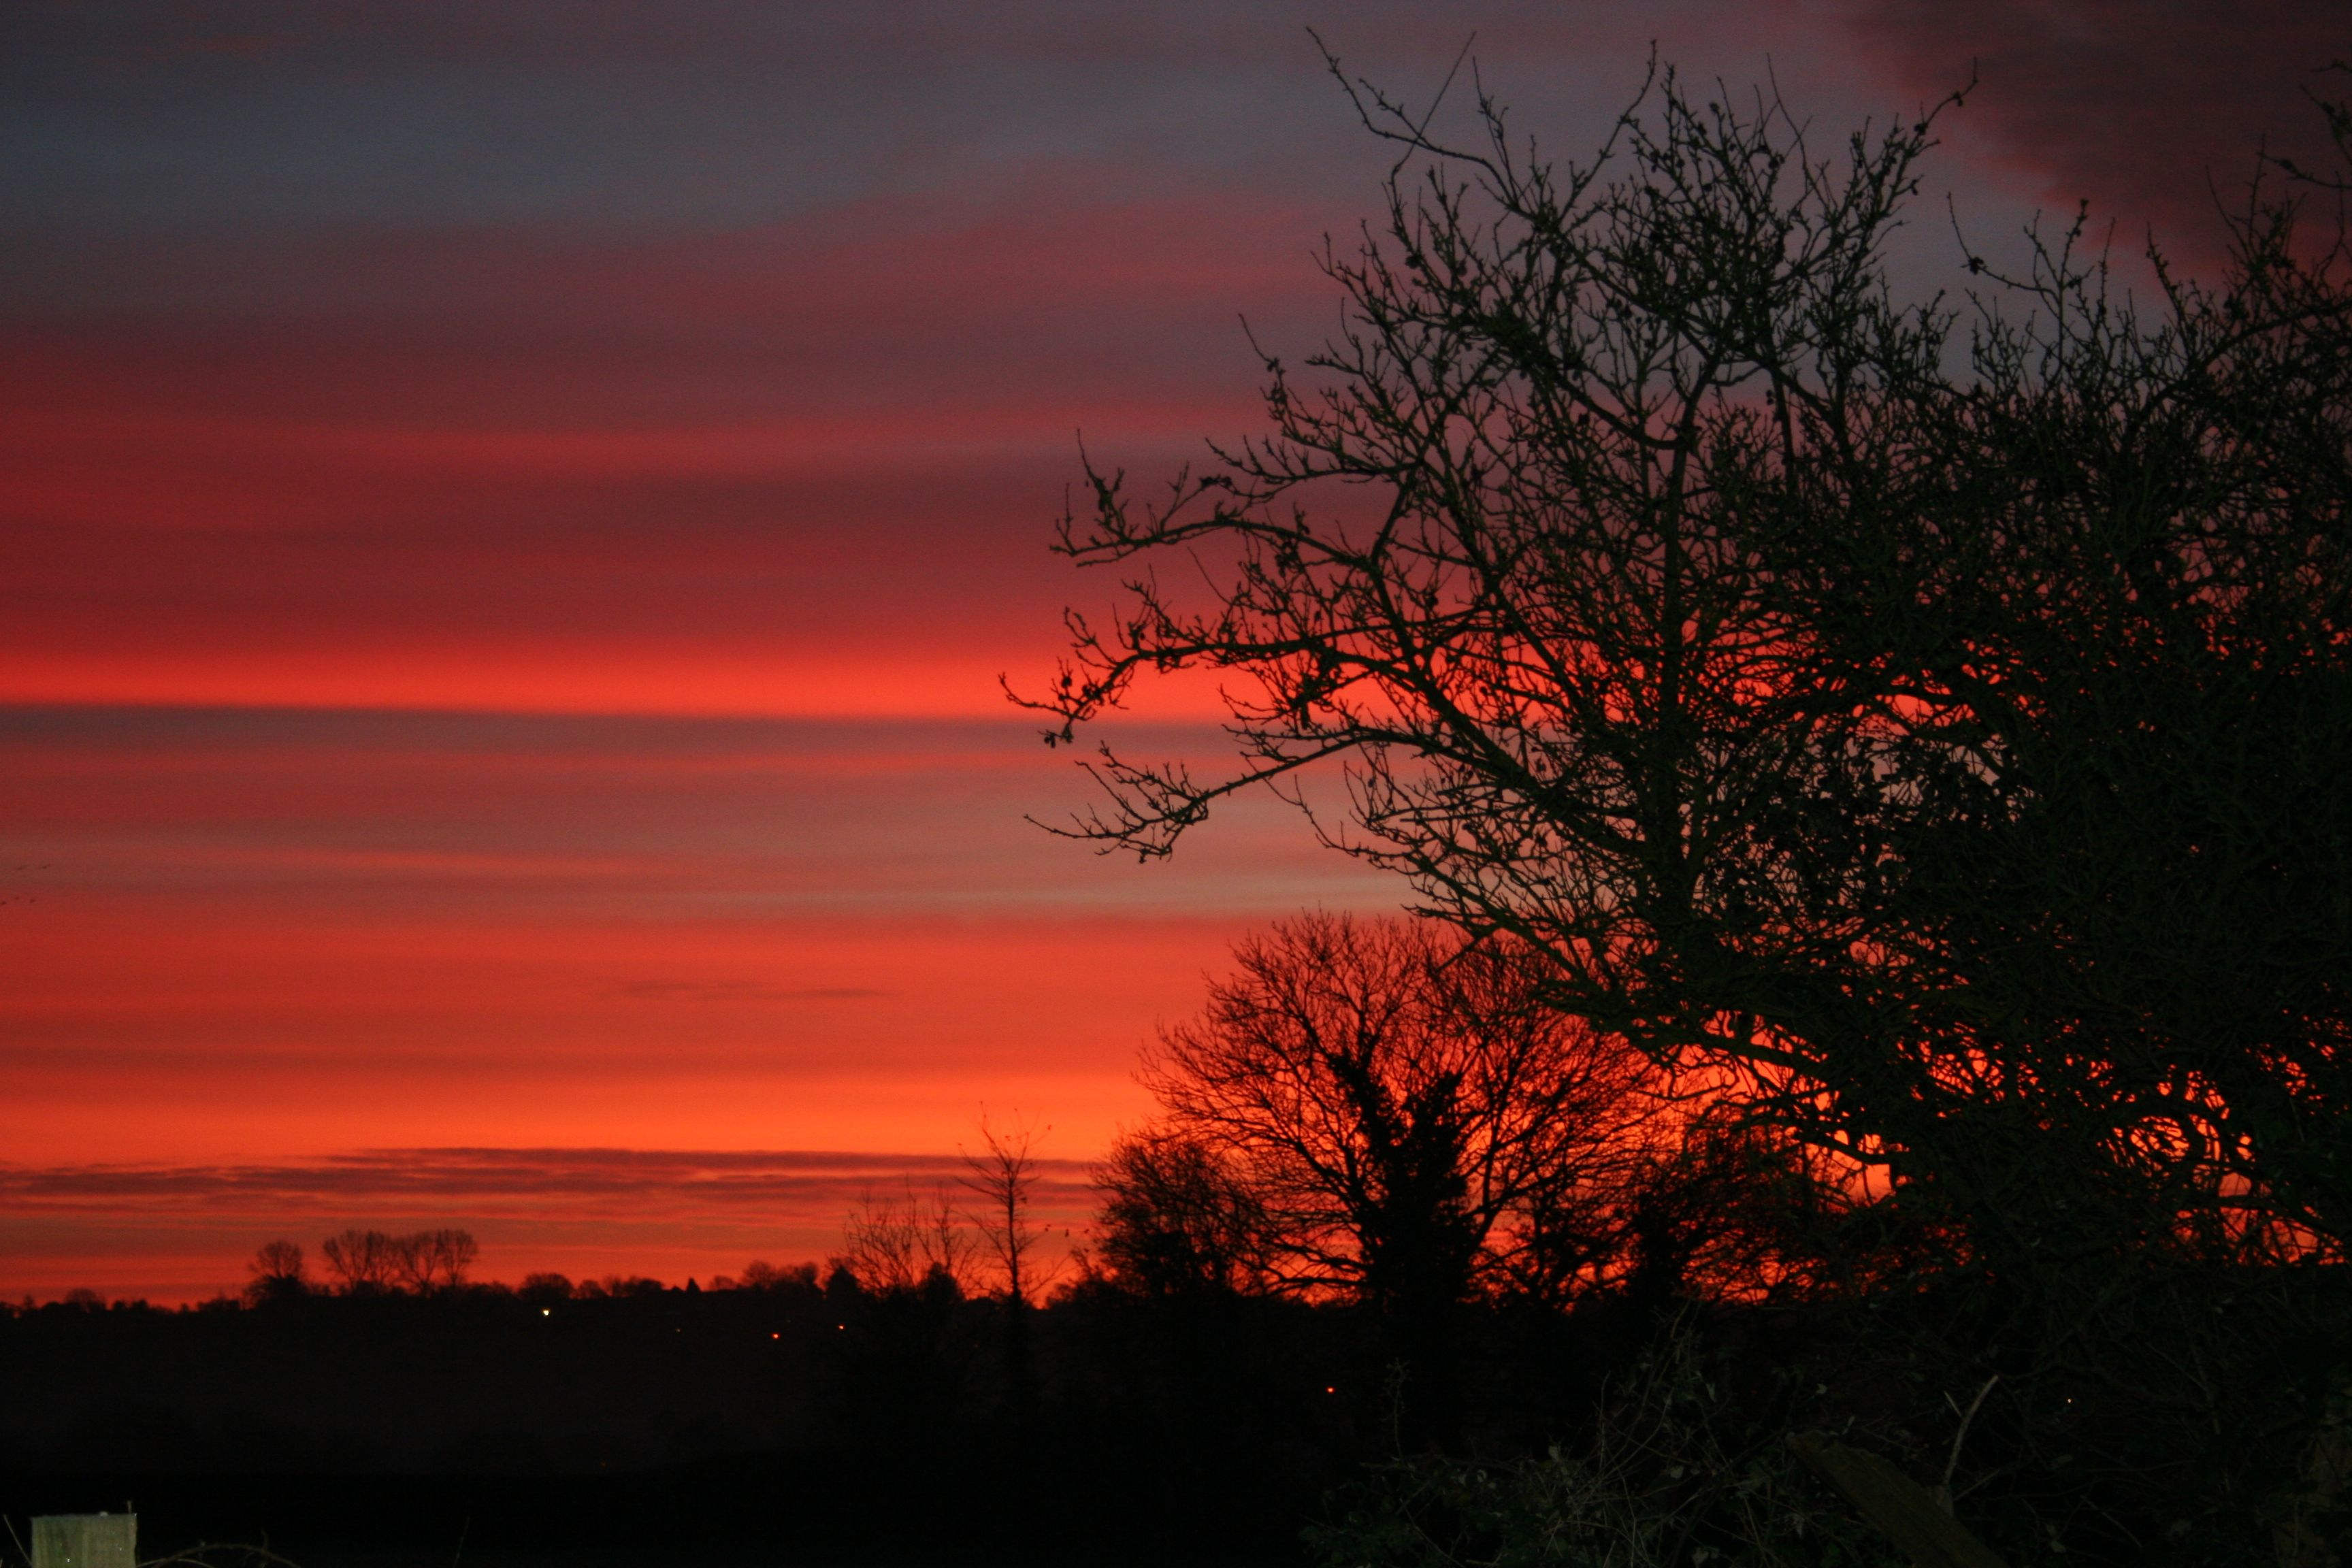 Sunrise in South Somerset December 2014